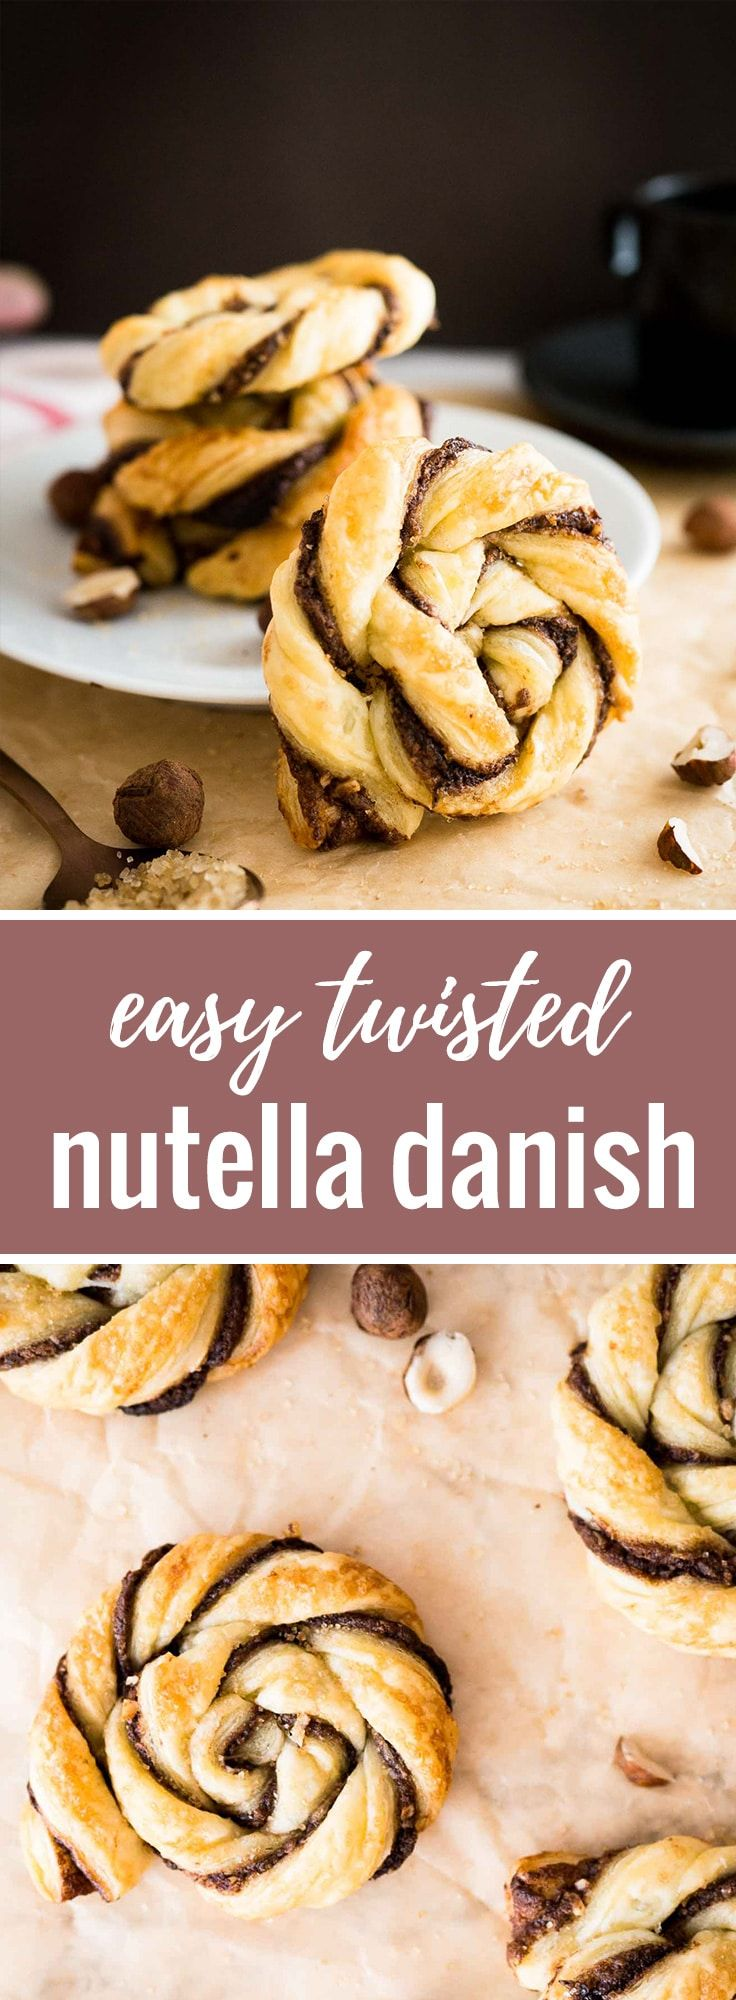 Nutella Danish | Danish pastry | Nutella pastry | Puff Pastry | Easy Puff Pastry Dessert | Hazelnuts | Brunch | Breakfast pastries | 30-minute dessert